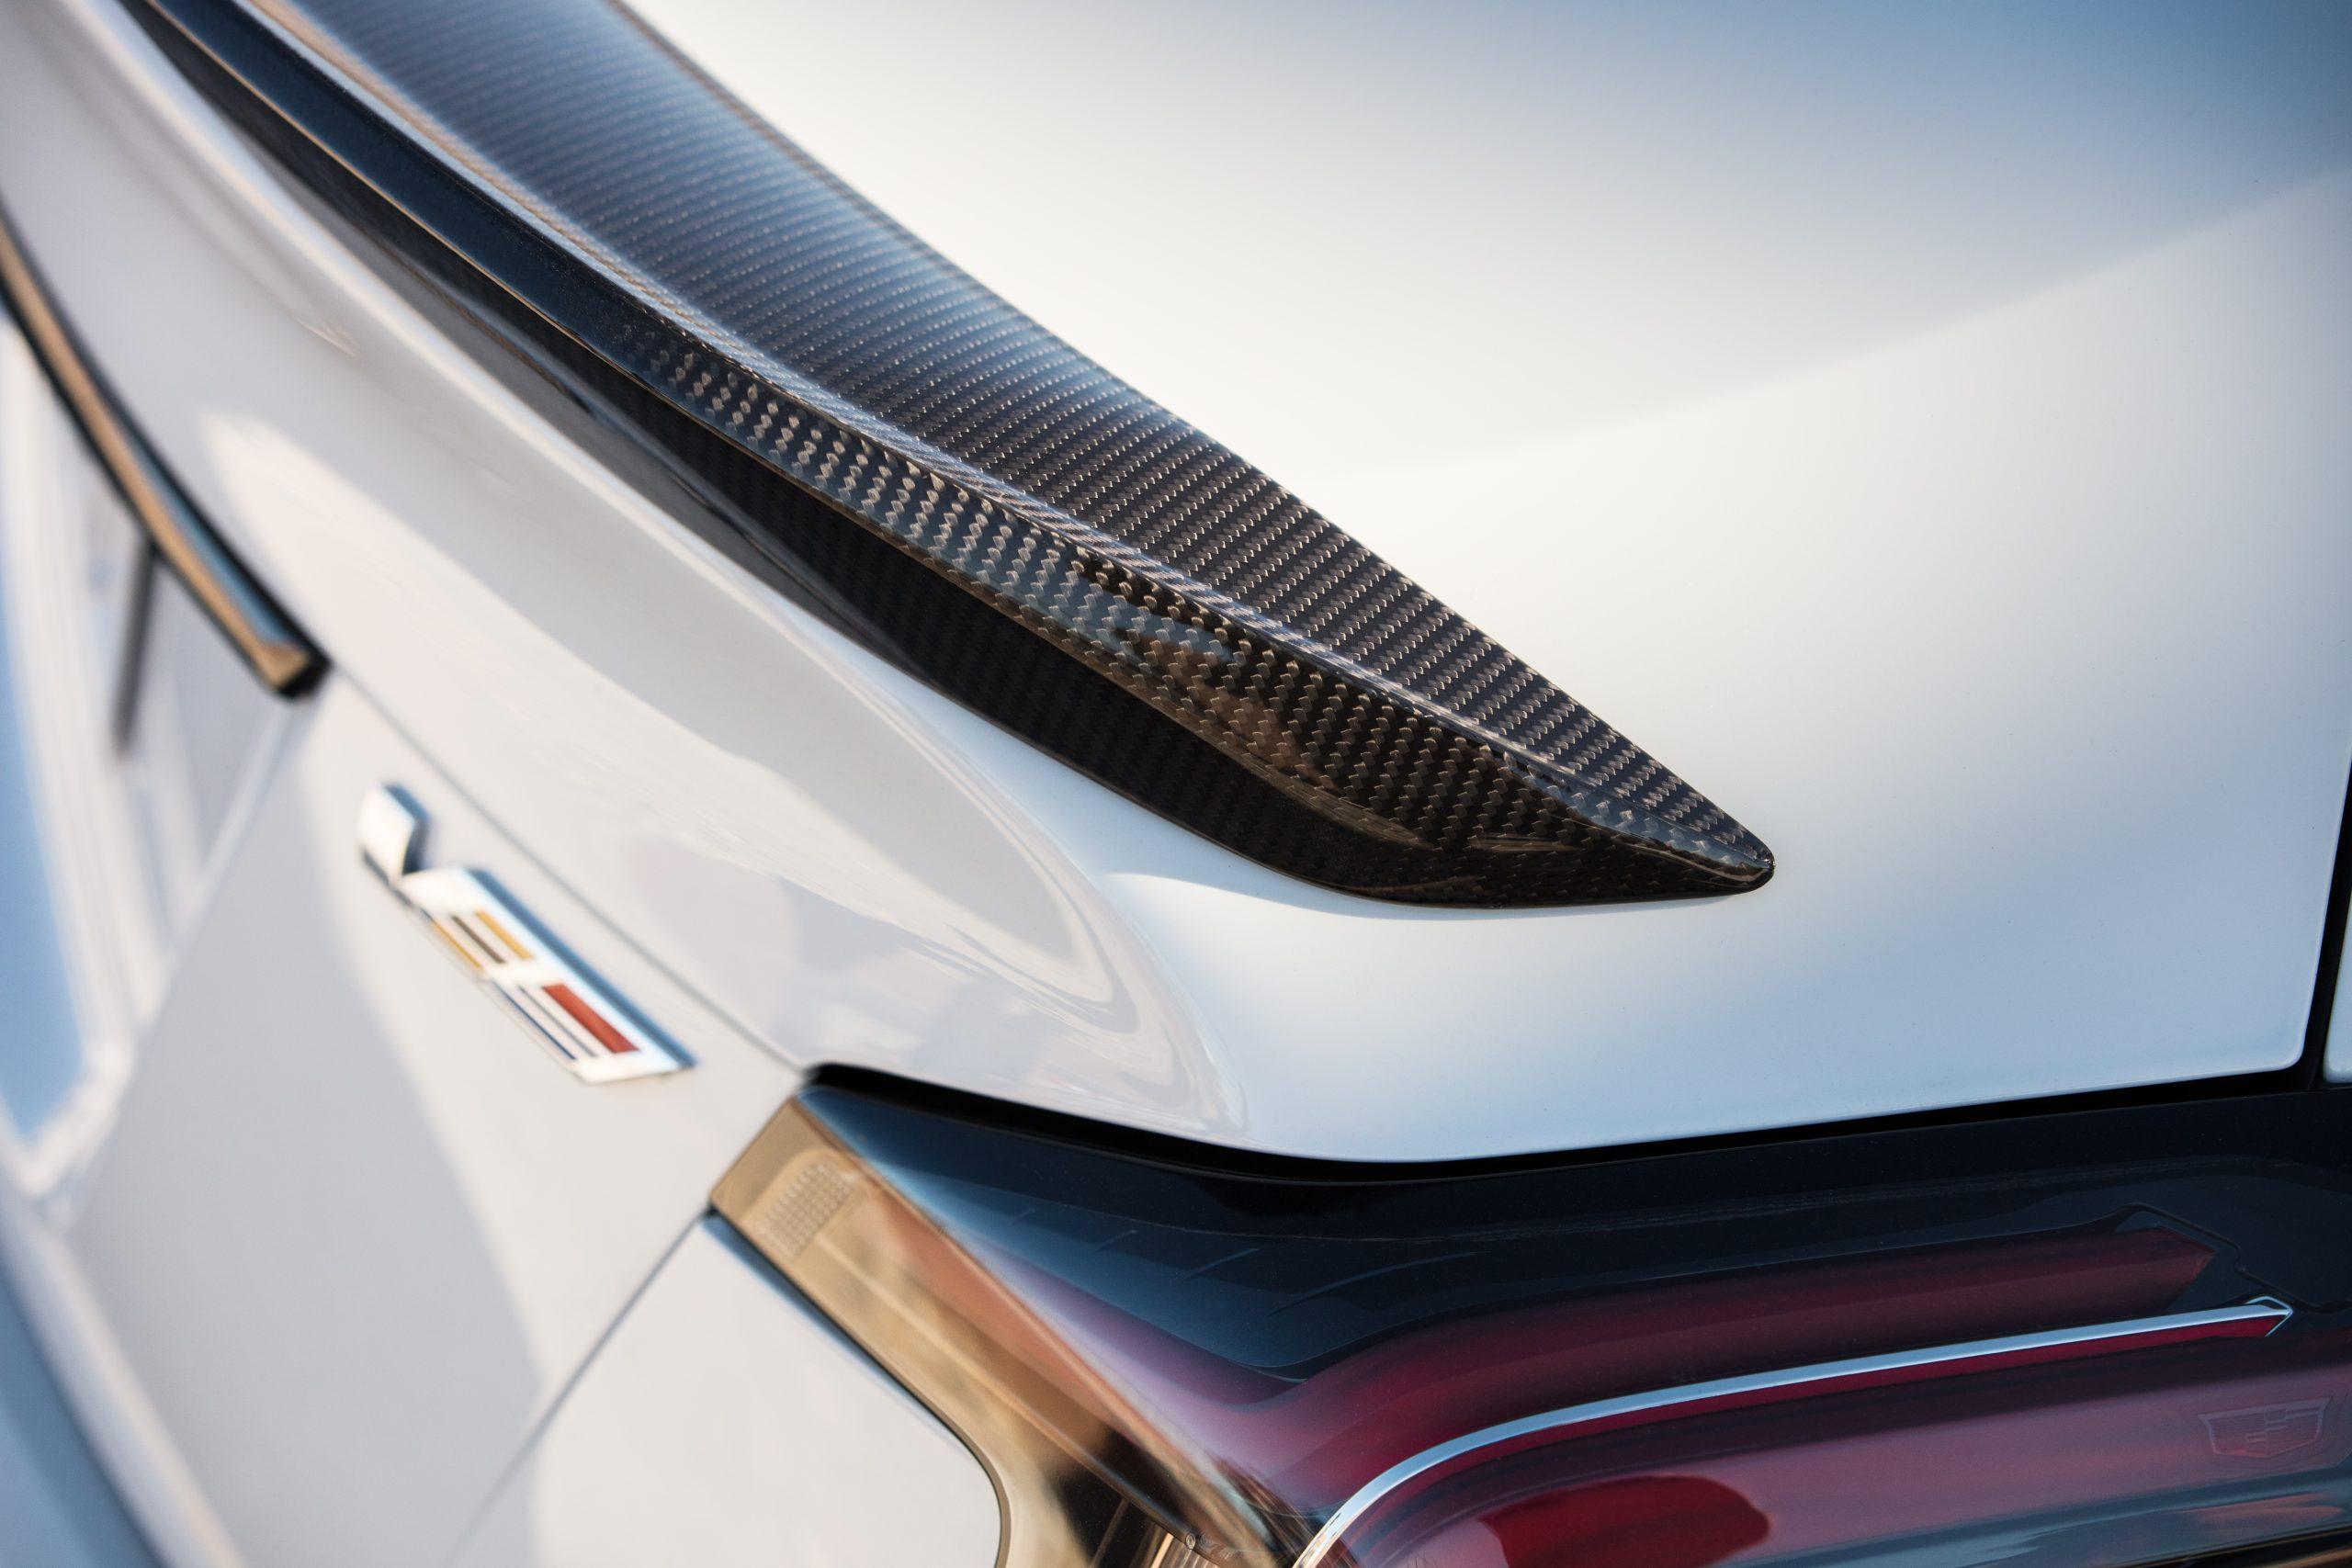 2022 Cadillac CT5-V Blackwing rear spoiler